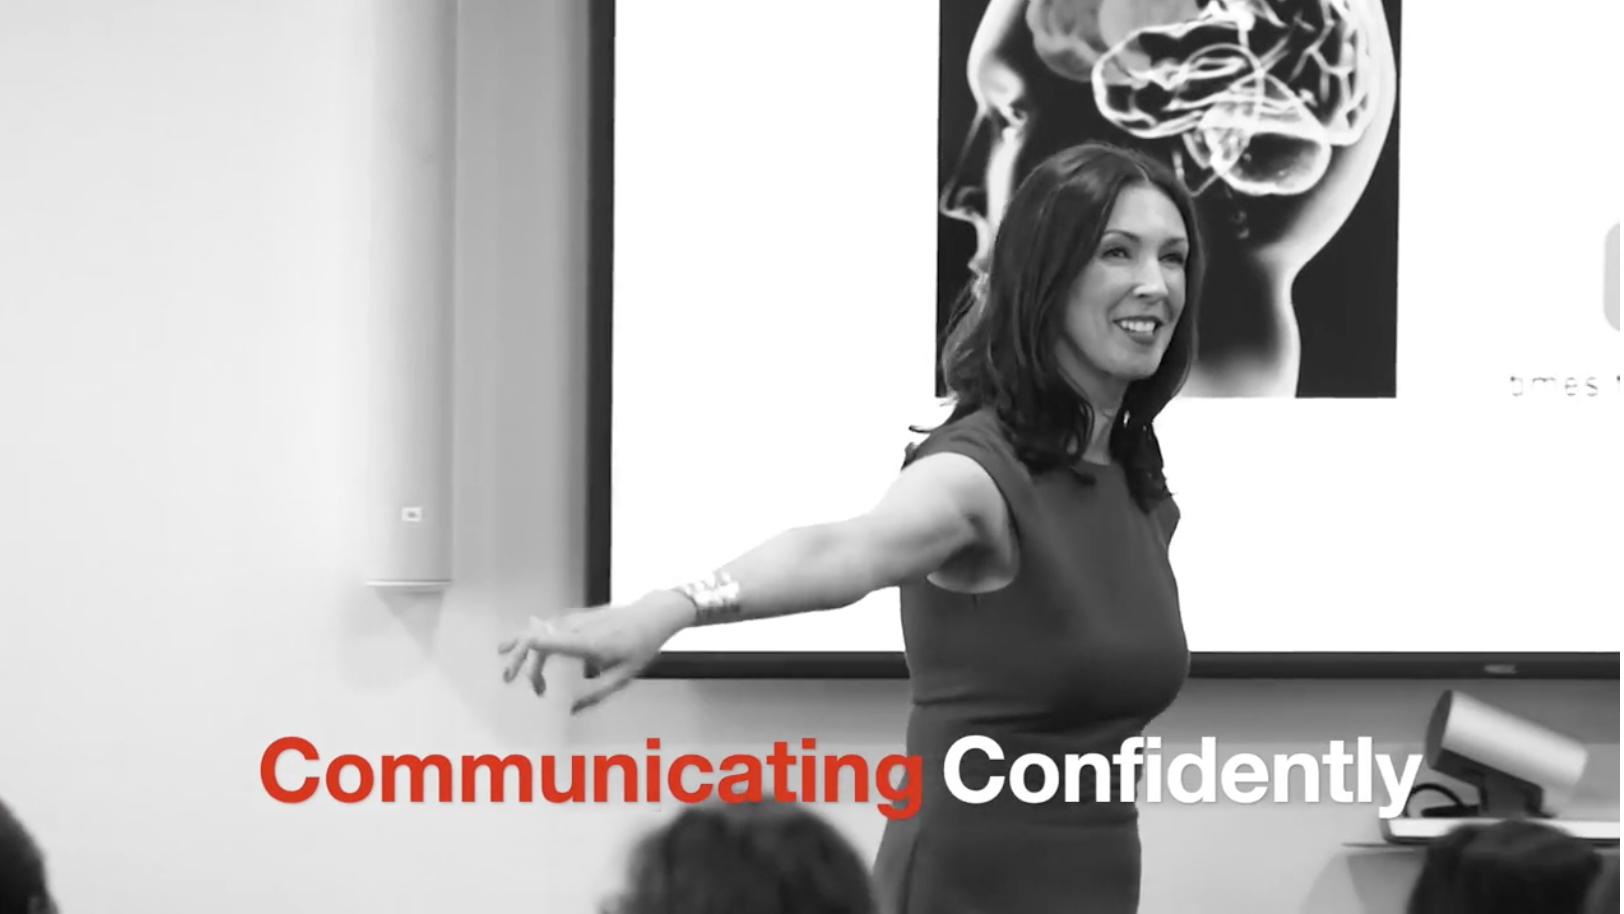 Communicating Confidently